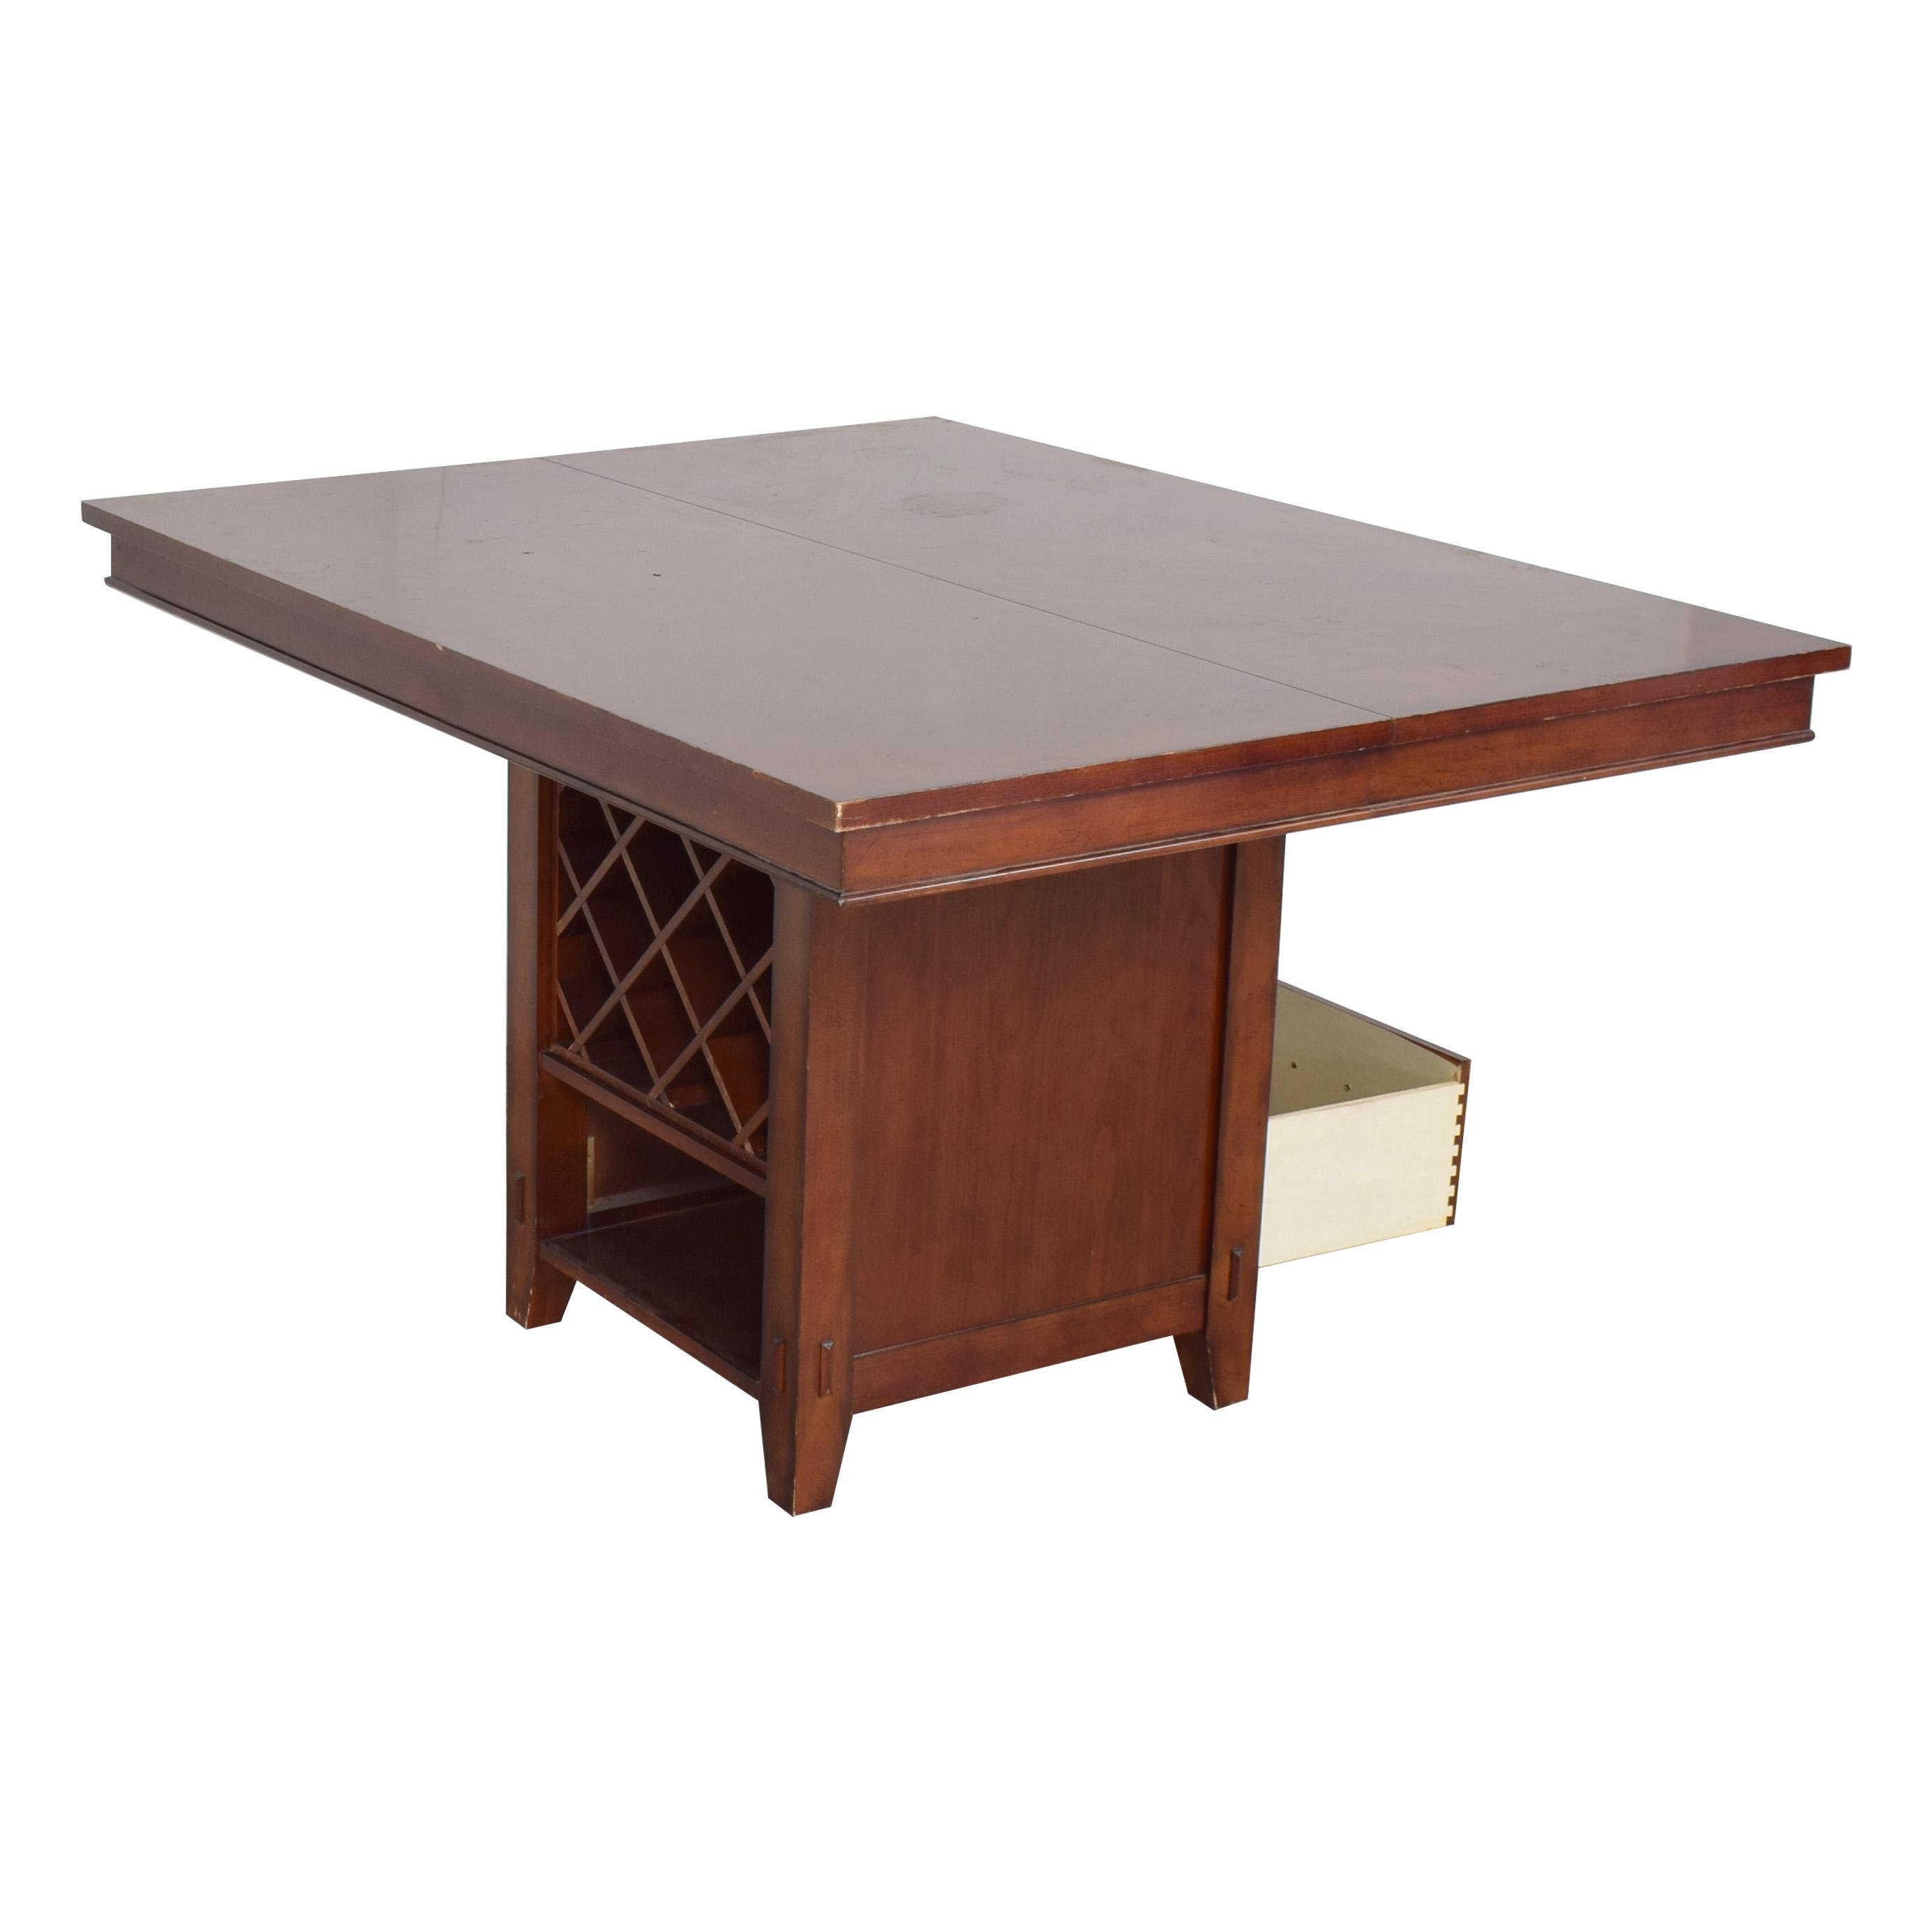 Broyhill Furniture Broyhill Furniture Vantana Dining Table dimensions